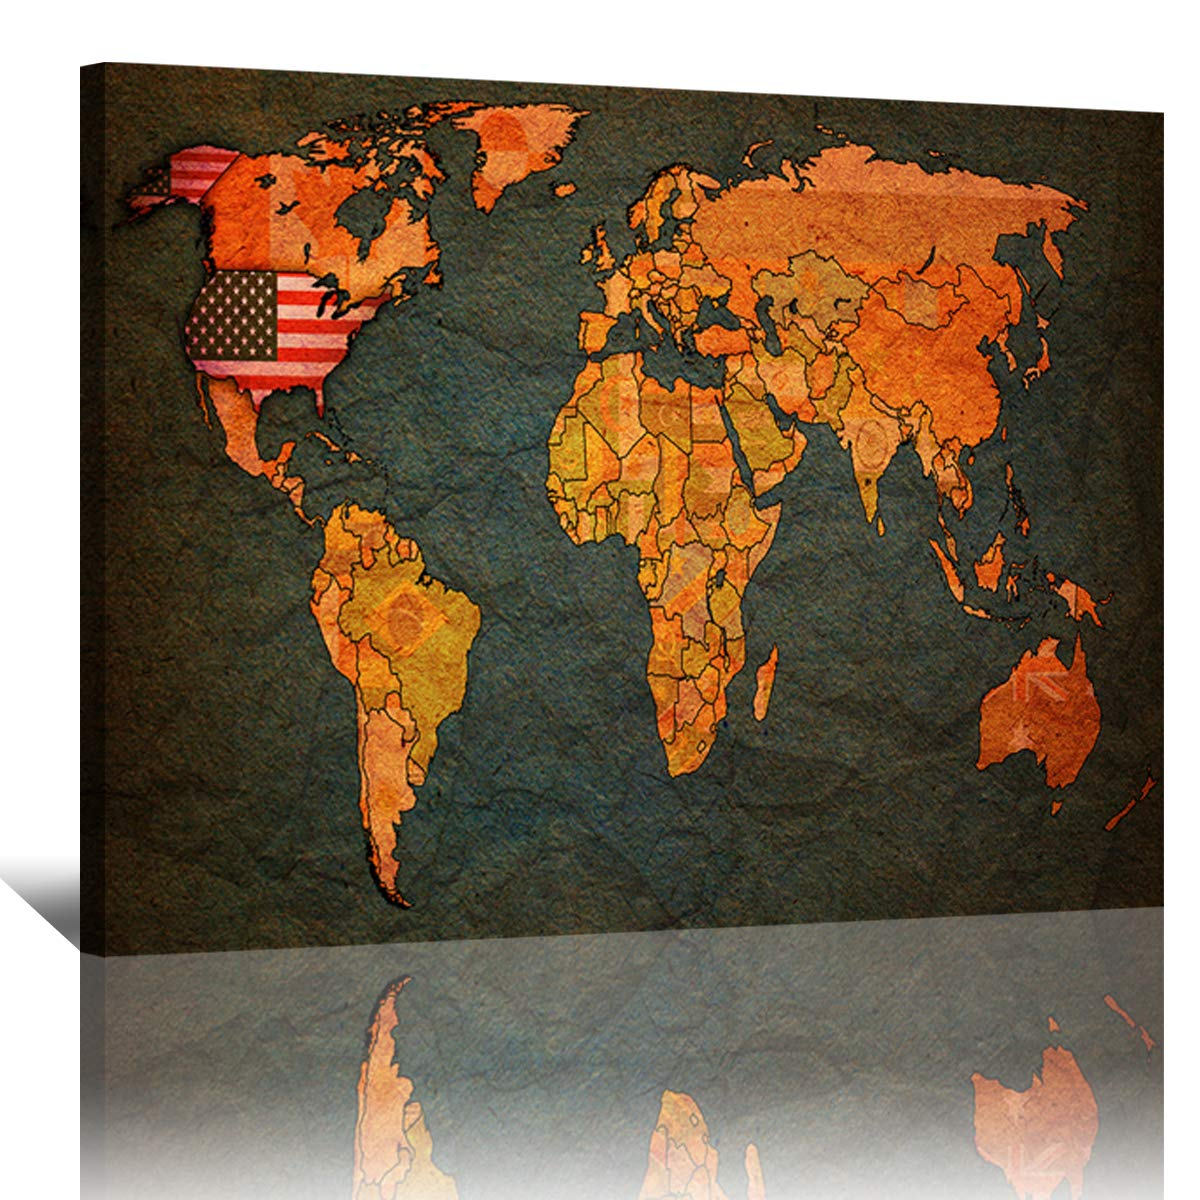 Amazon.com: DAXIPRI 1 Pieces World Map Canvas Print Wall Art ... on bhutan world map, qatar on world map, jordan world map, pakistan world map, israel world map, bahamas world map, sudan world map, palestine world map, oman world map, belarus world map, tonga world map, egypt world map, kuwait world map, netherlands world map, united arab emirates world map, tanzania world map, ukraine world map, burma world map, benin on world map, bahrain world map,